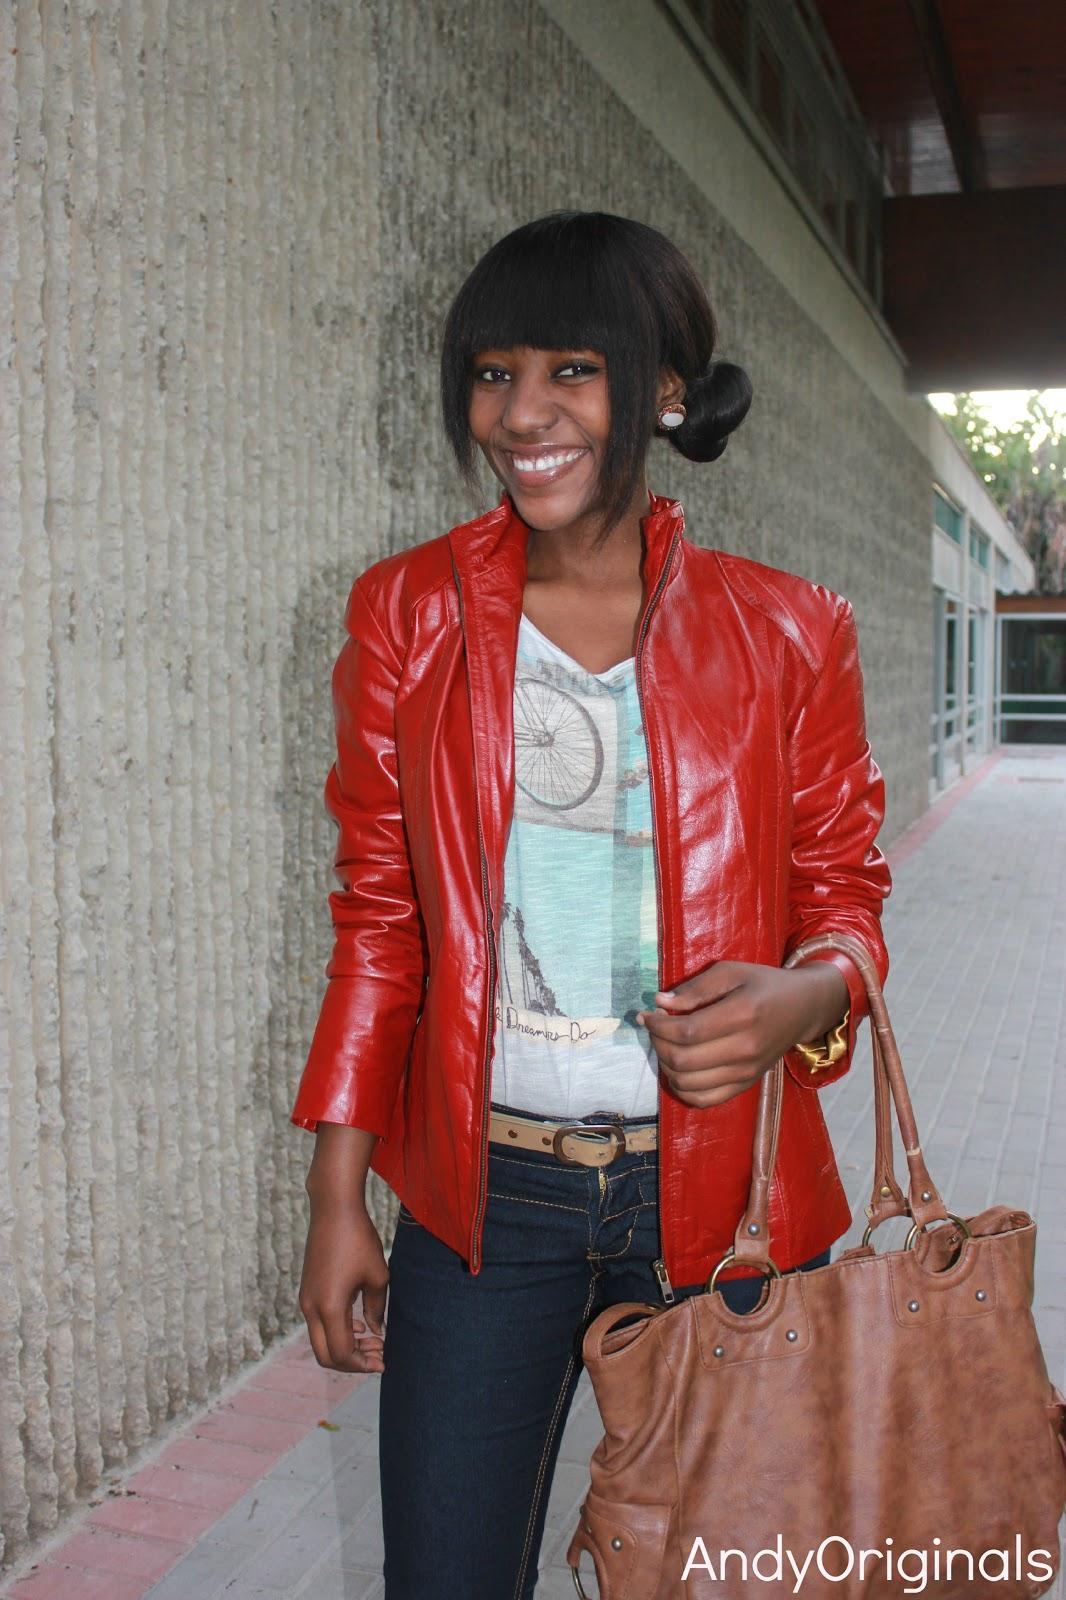 BlackBoldVoice: Street Style: Black Girls Killing It